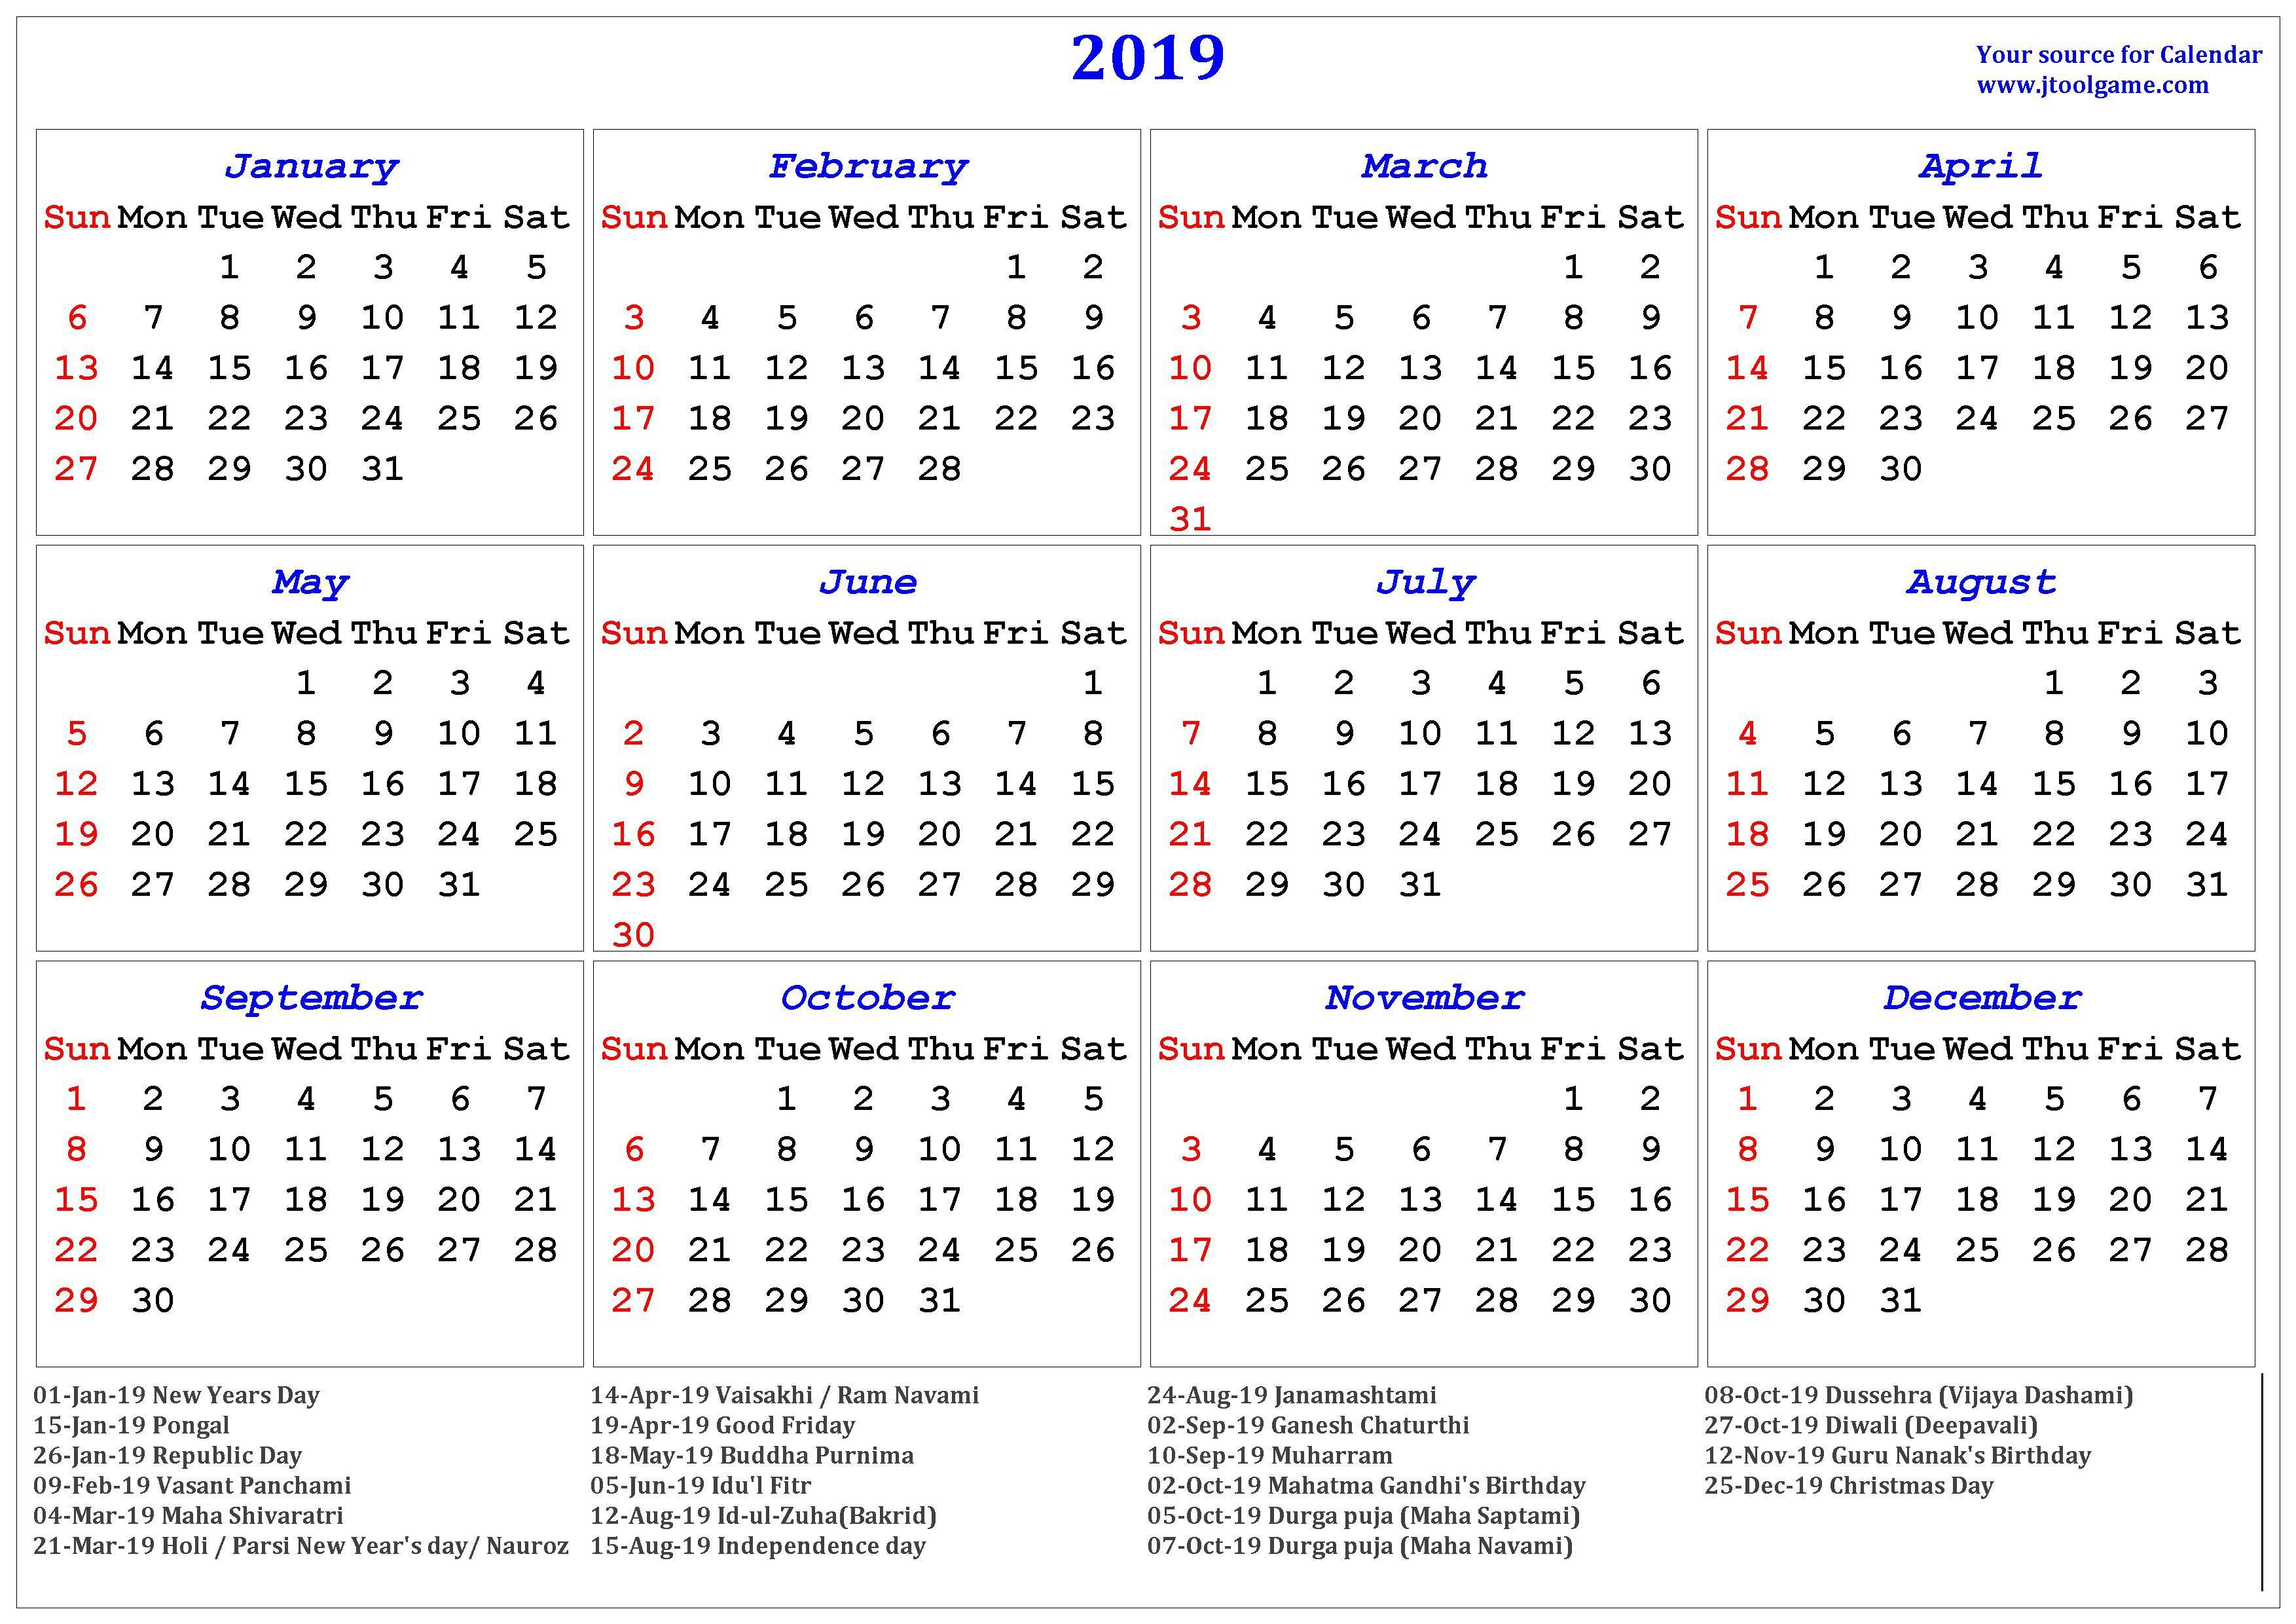 2019 Hindu Calendar With Tithi | Tyohar, Holidays, Festivals Calendar Of 2019 With Hindu Festival